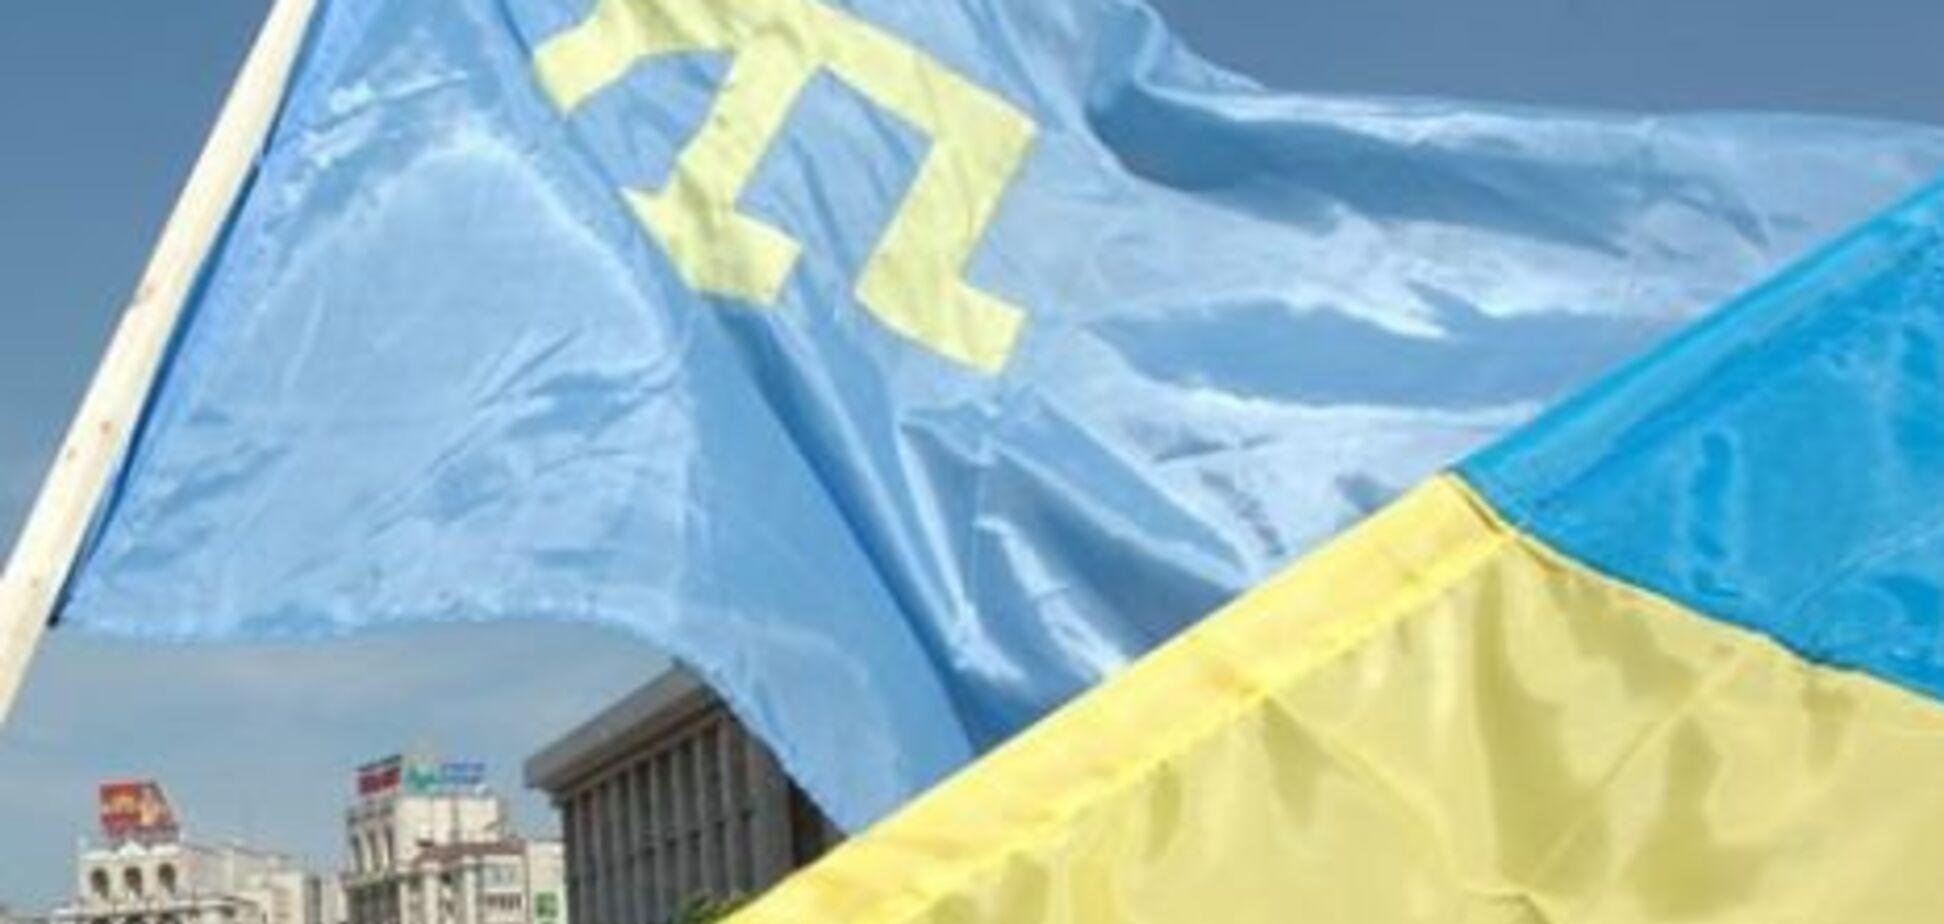 Новости Крымнаша. Два прапори — єдина країна